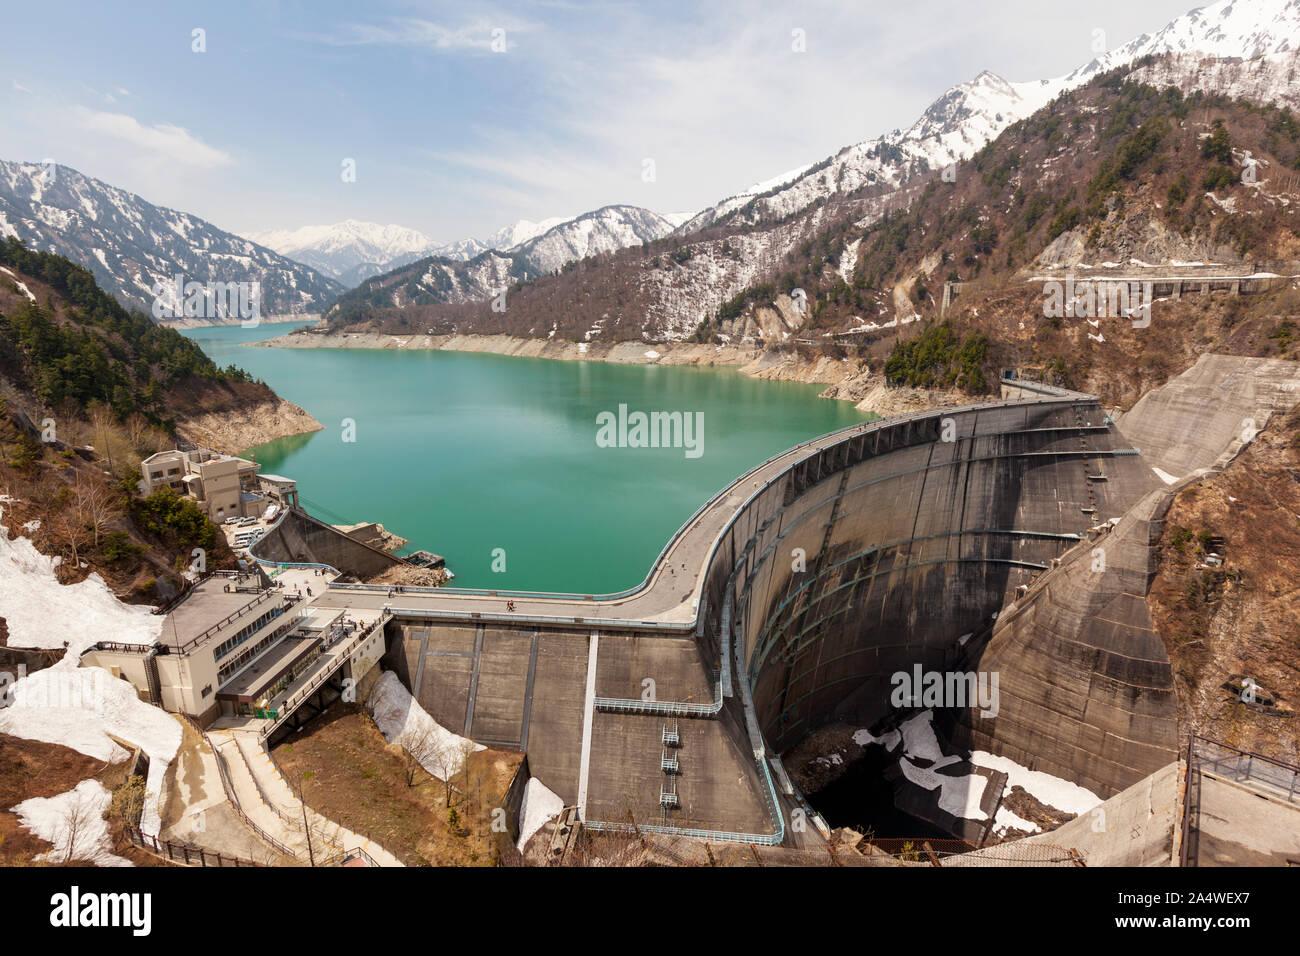 Wide view of Kurobe Dam and reservoir in Toyama, Japan Stock Photo